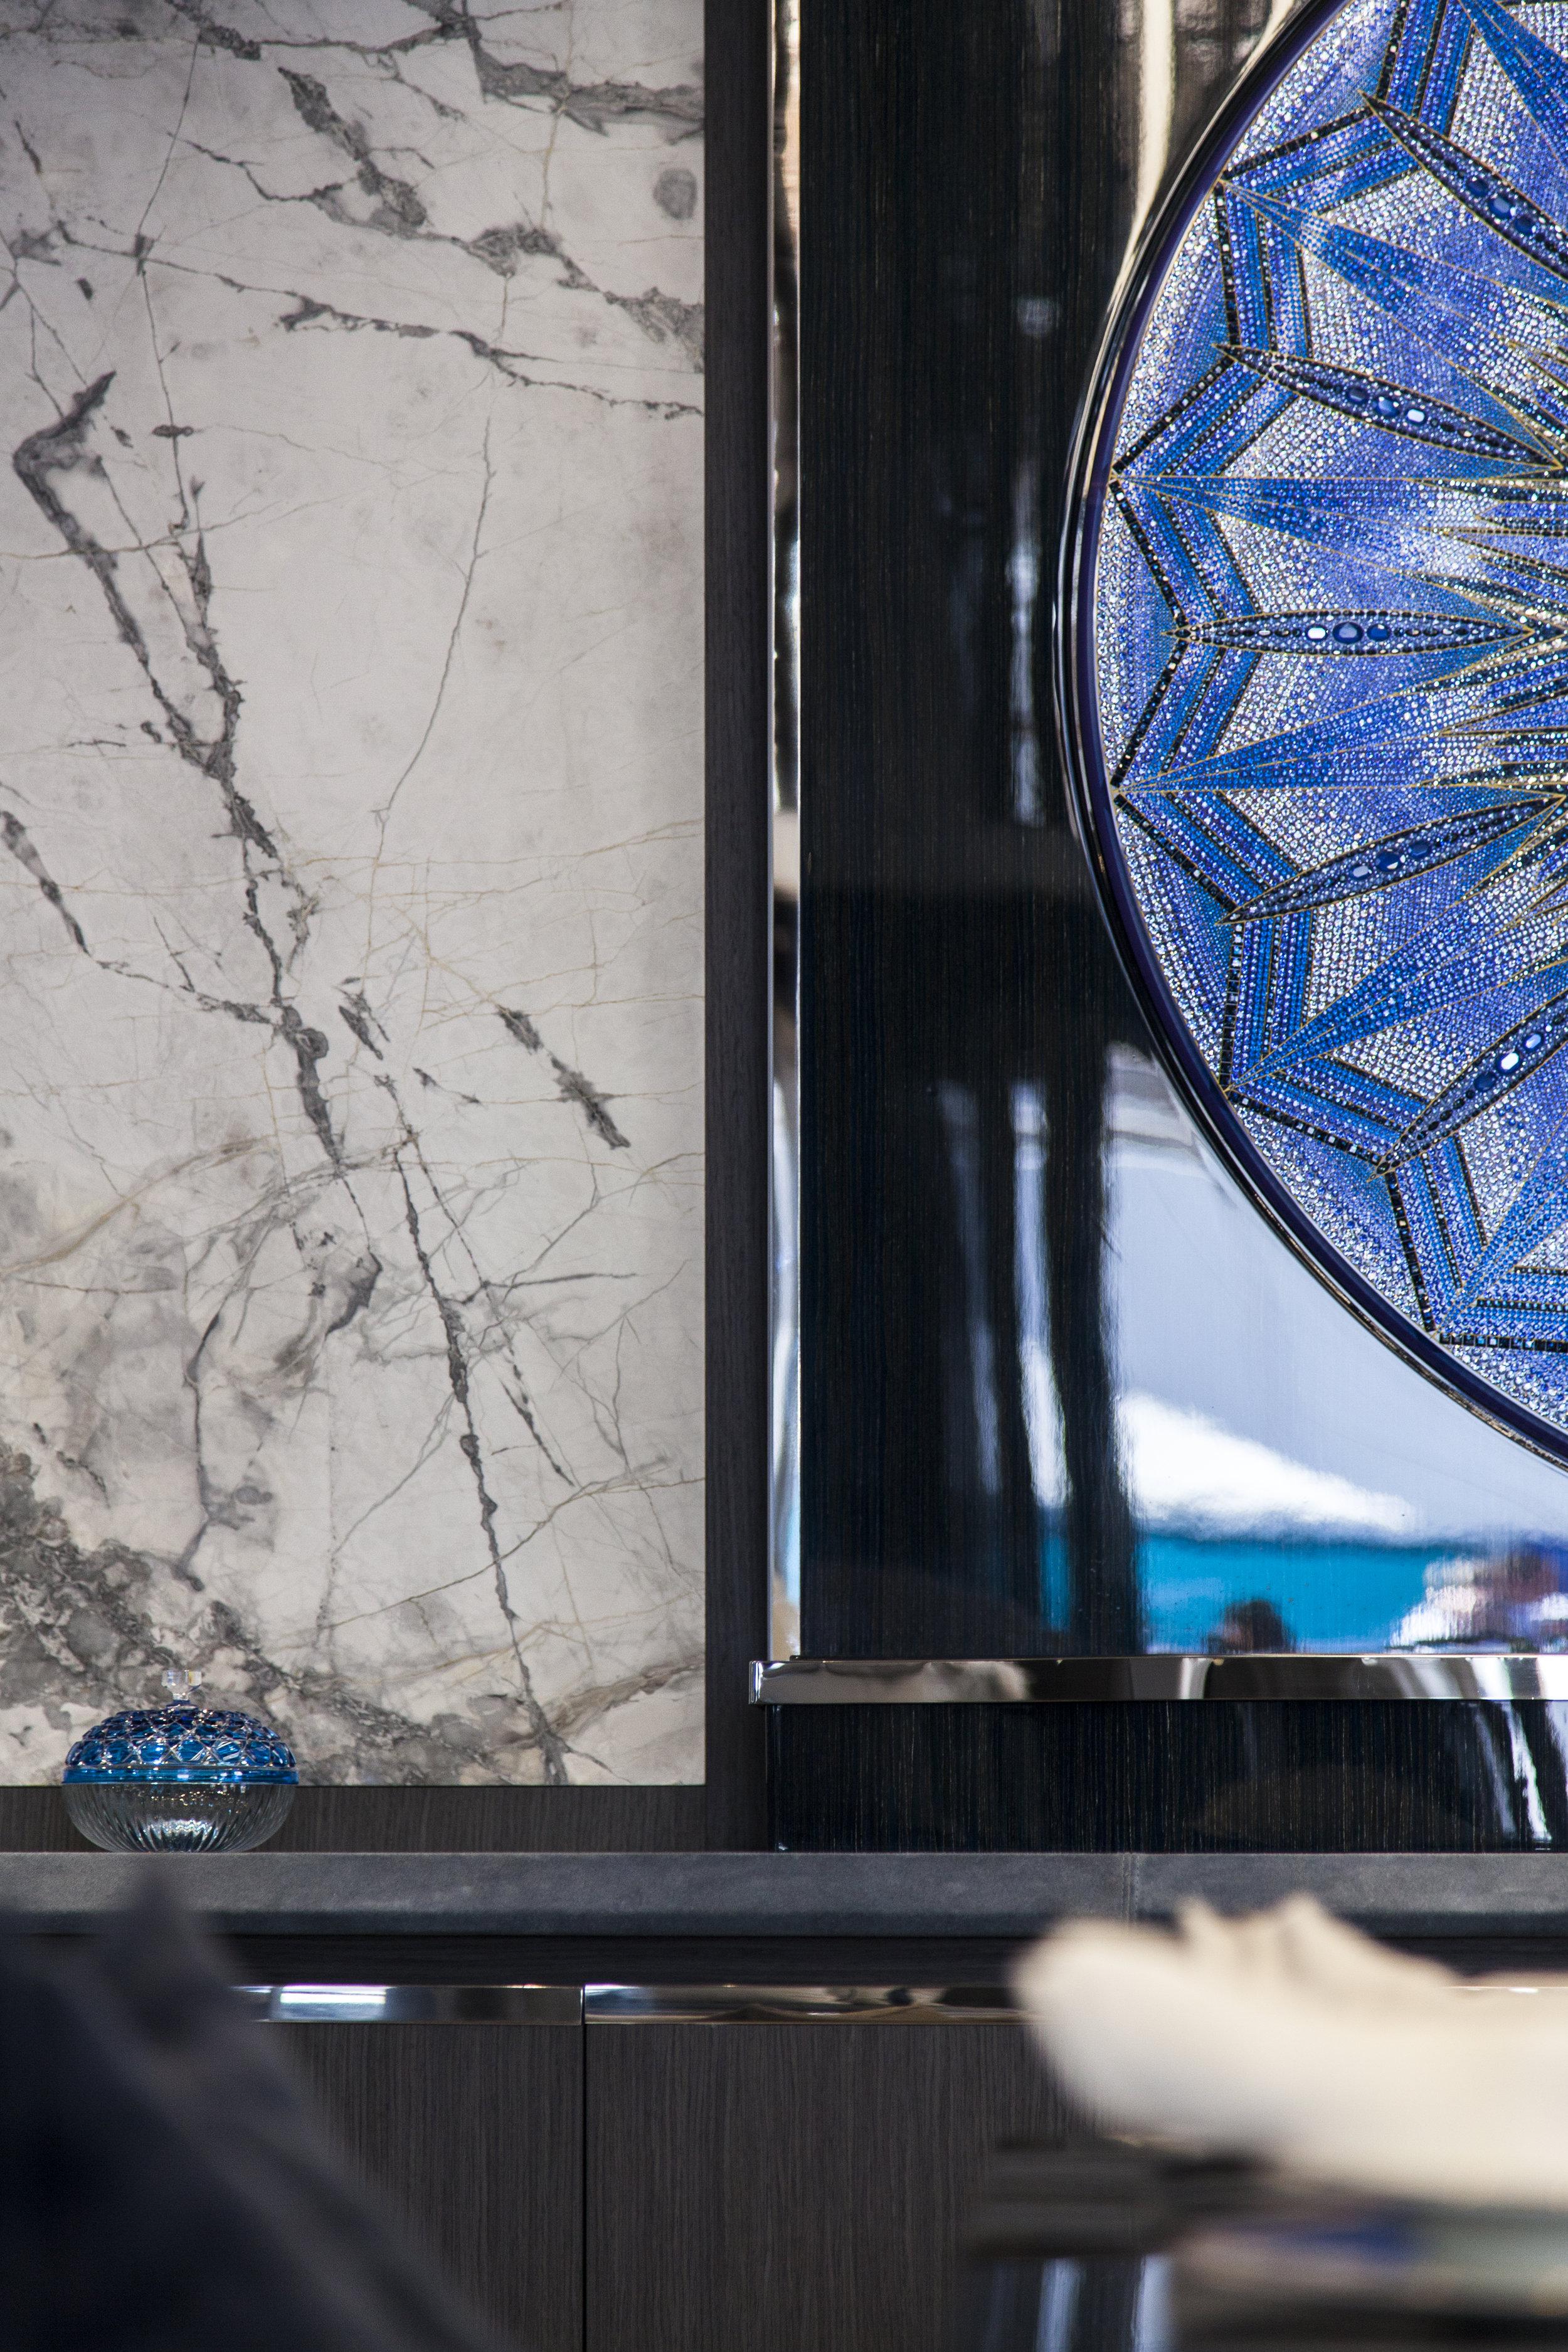 DOMINATOR ILUMEN 28M - CADET V - INTERIOR DESIGN AND PHOTO BY LUCA CATINO (6).jpg